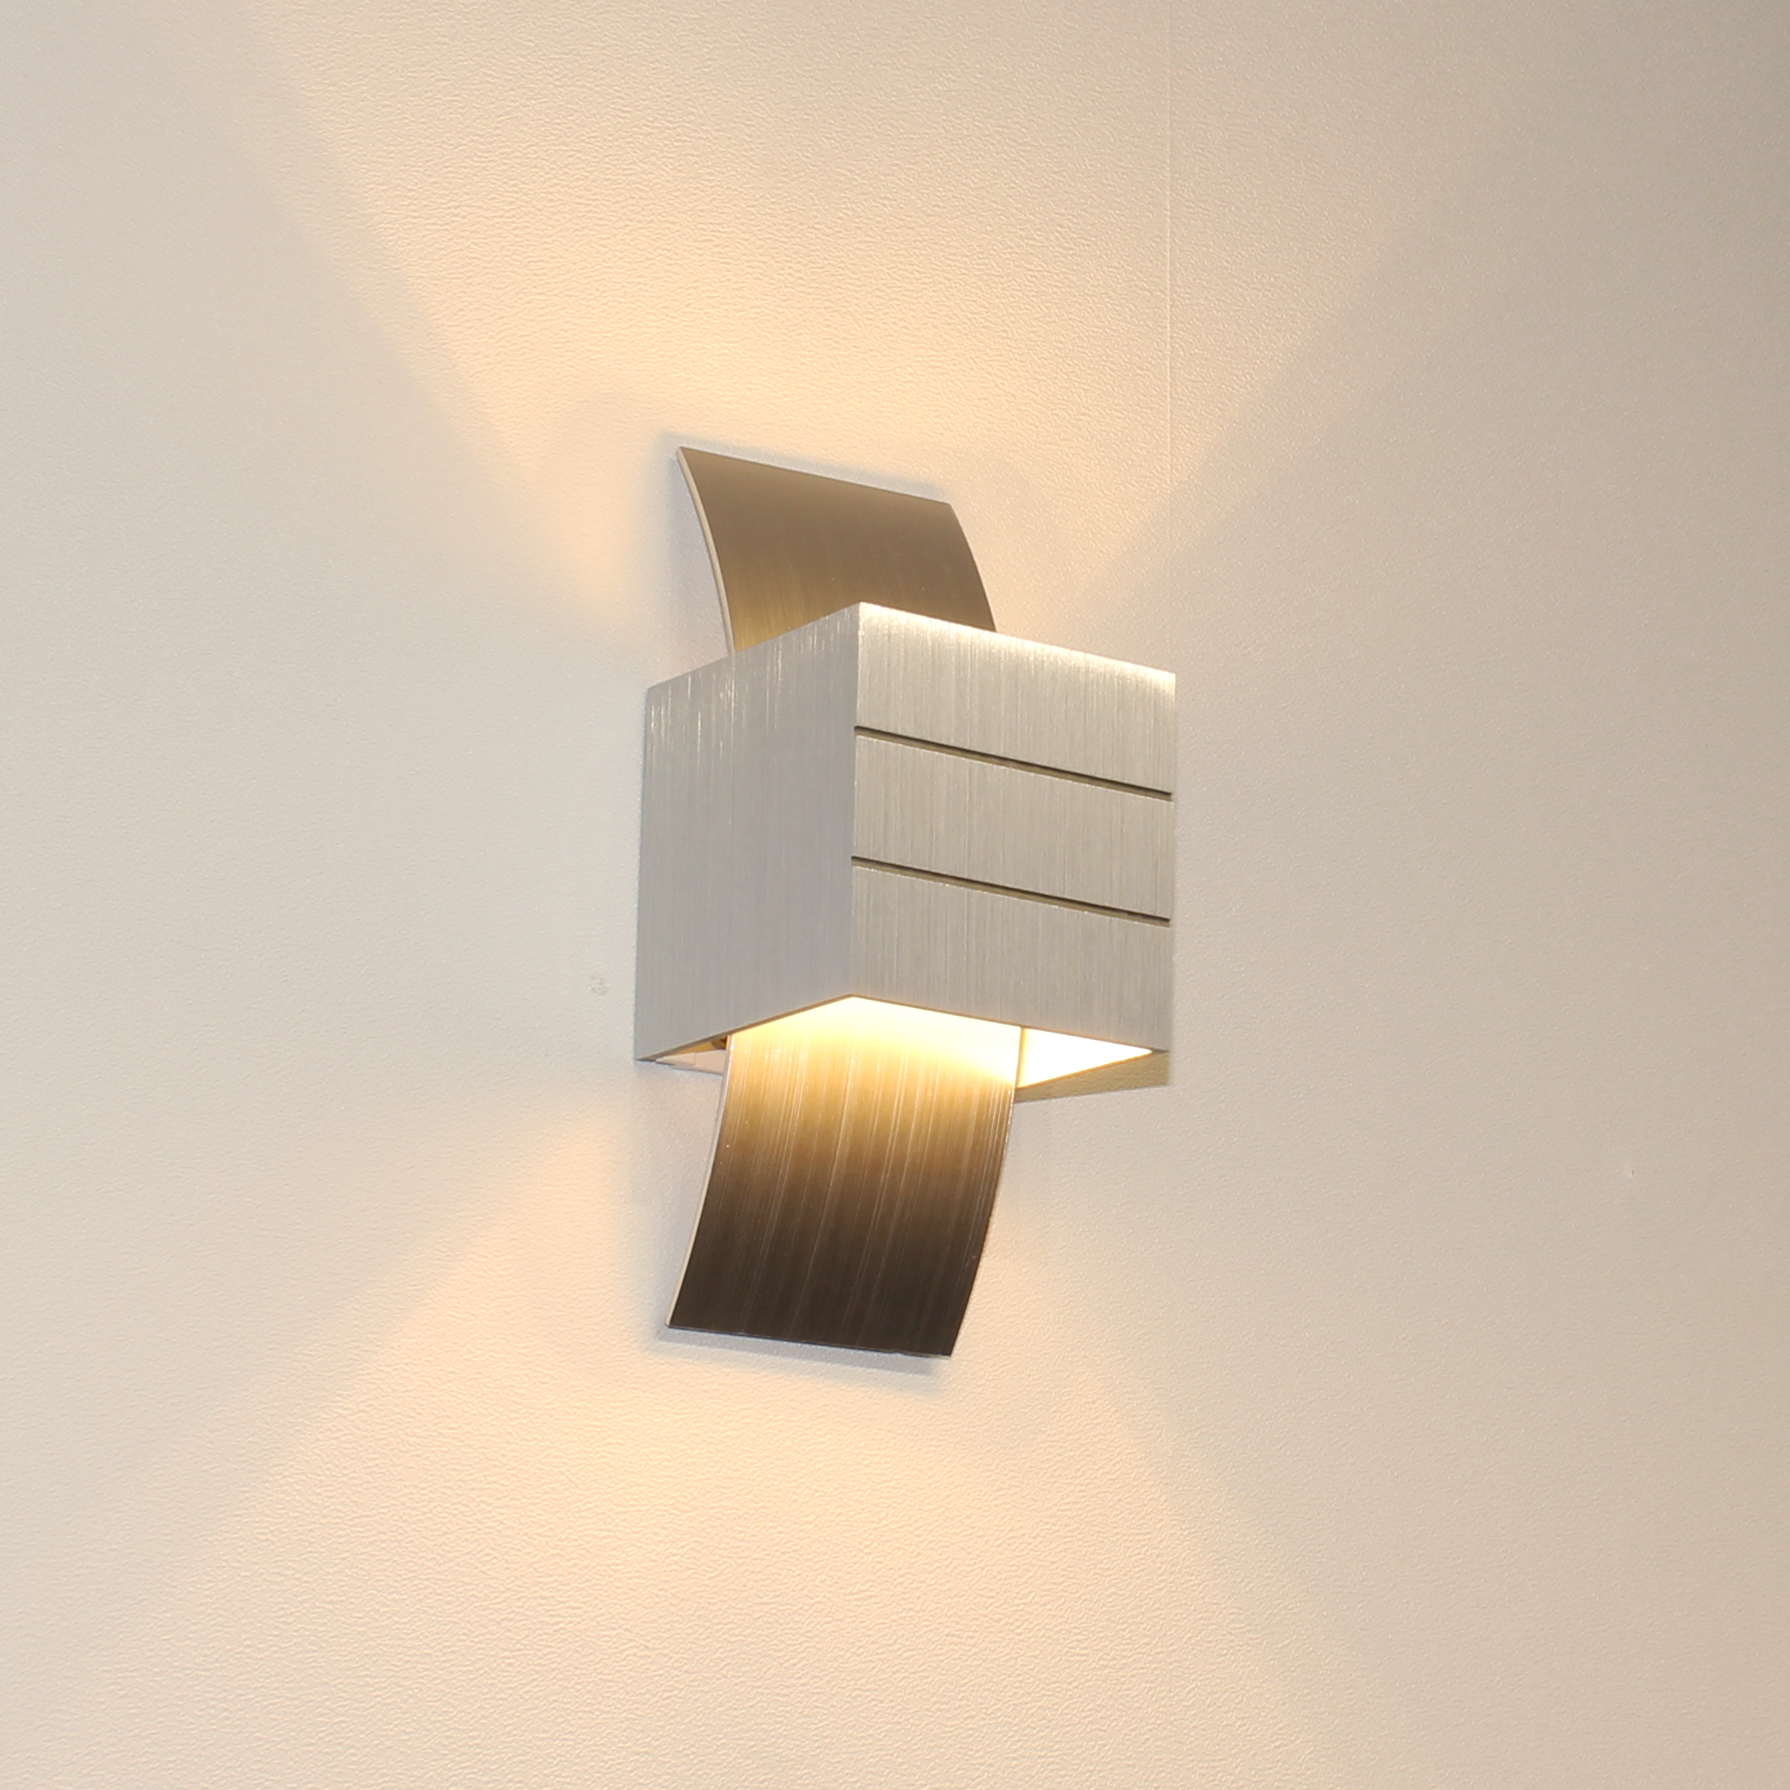 Artdelight Wandlamp Gyhum H 20 cm B 8 cm excl. G9 aluminium